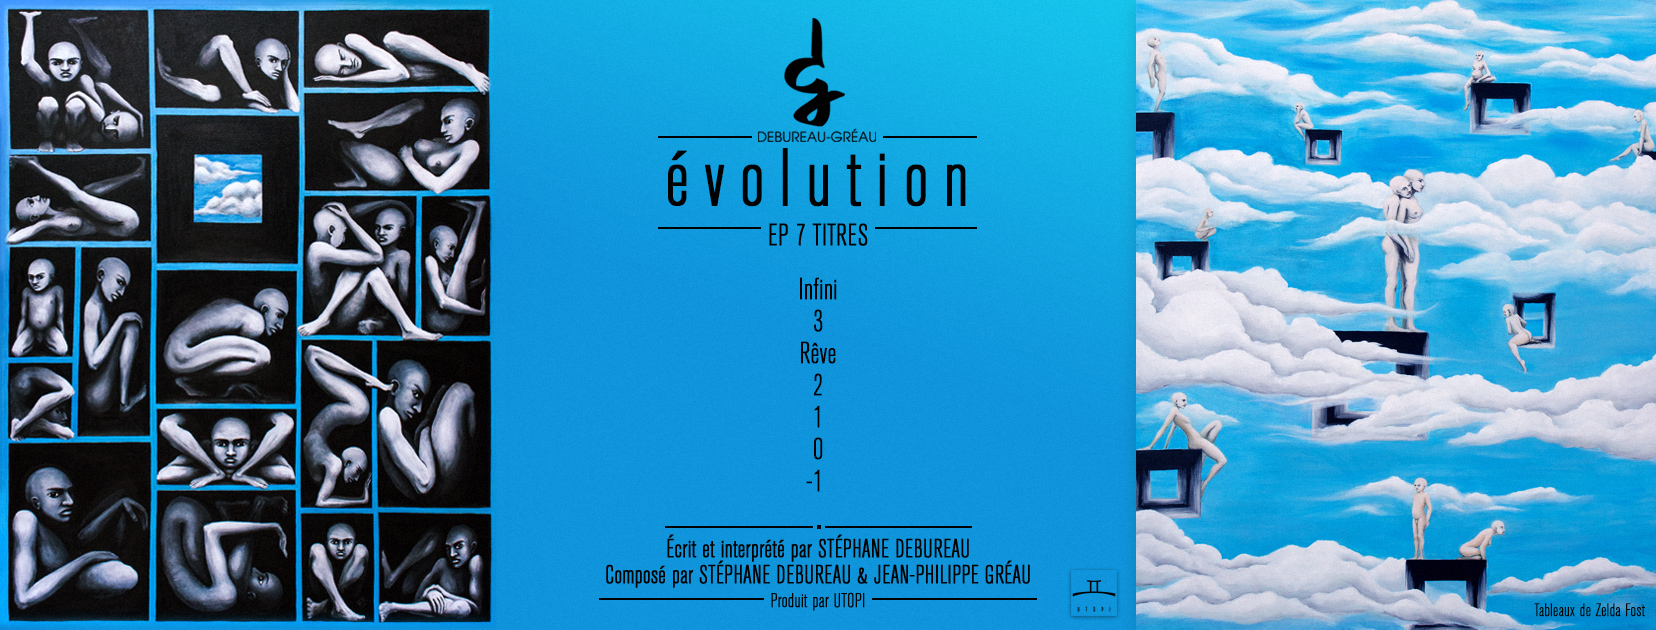 \u00c9volution